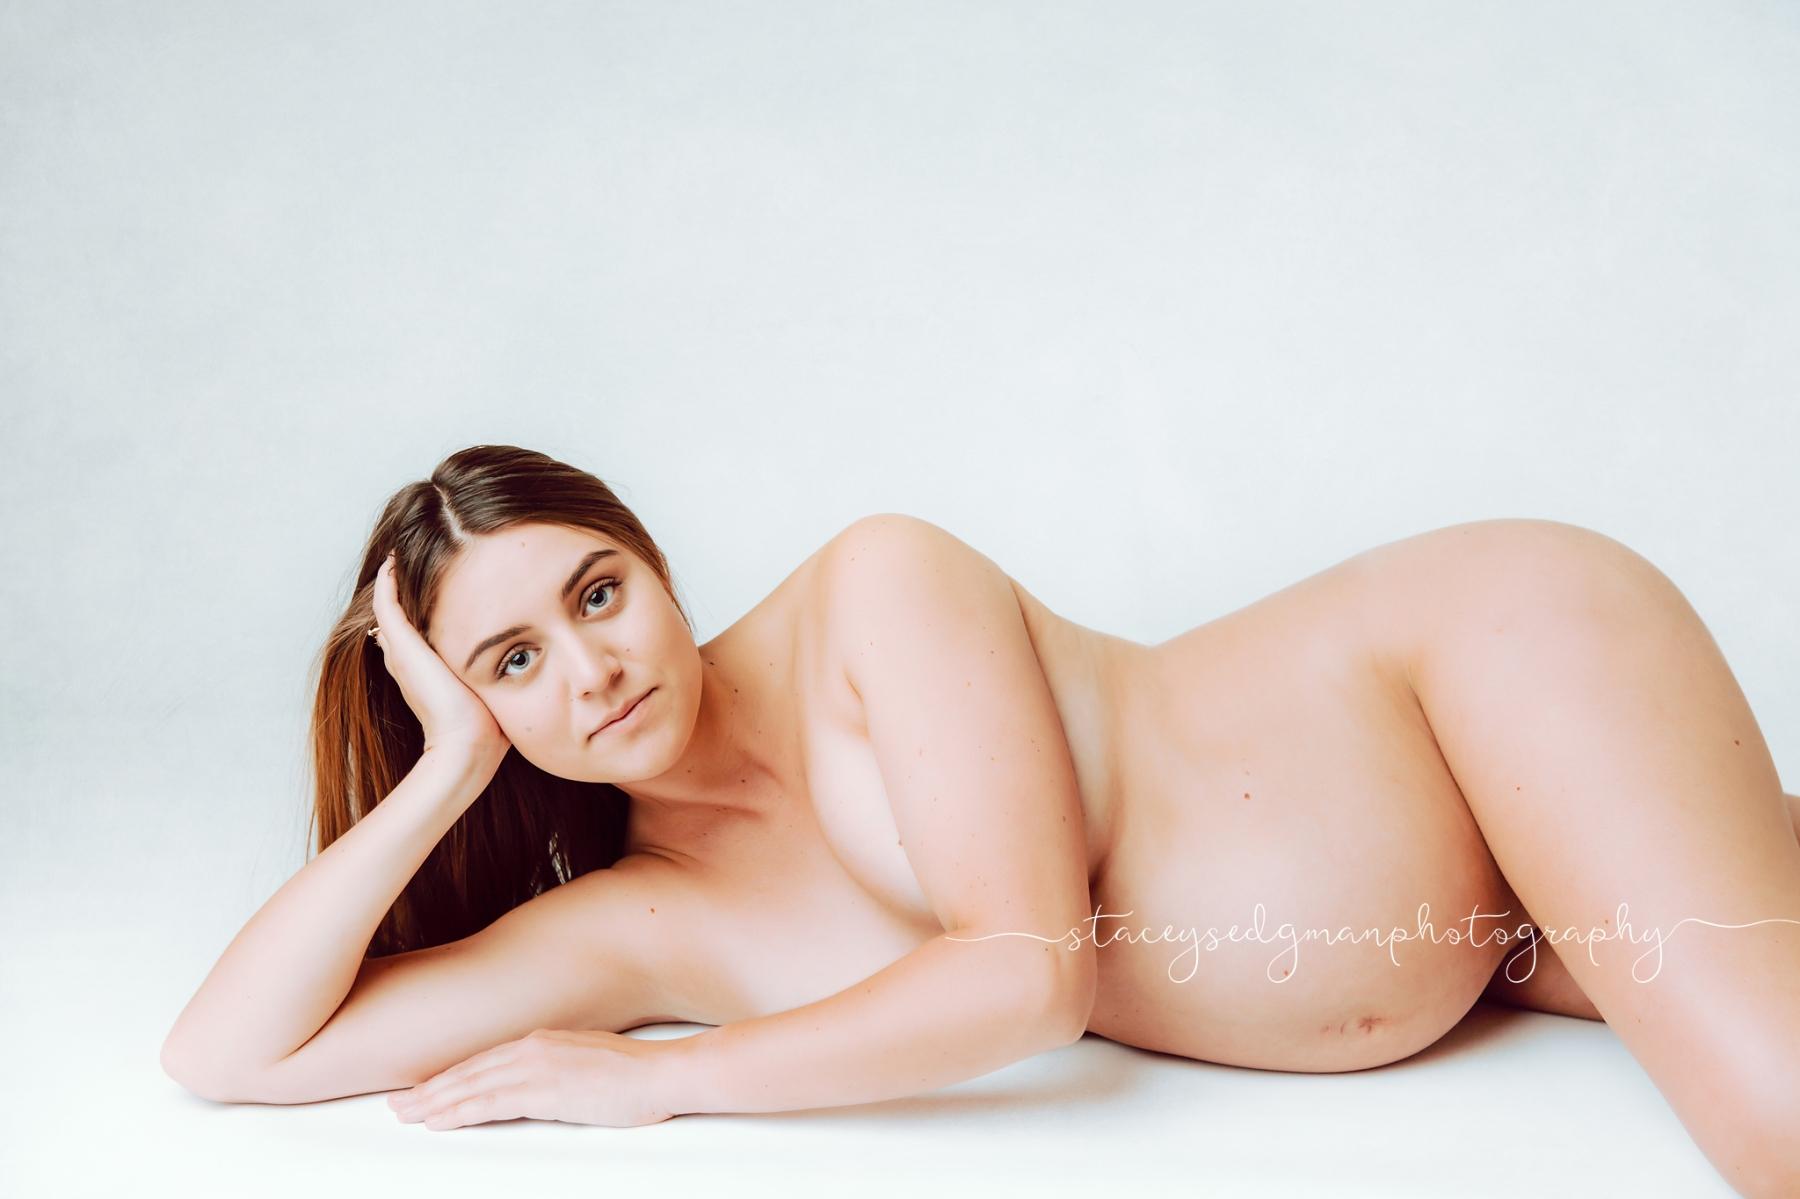 Nude pregnant mum boudoir photoshoot